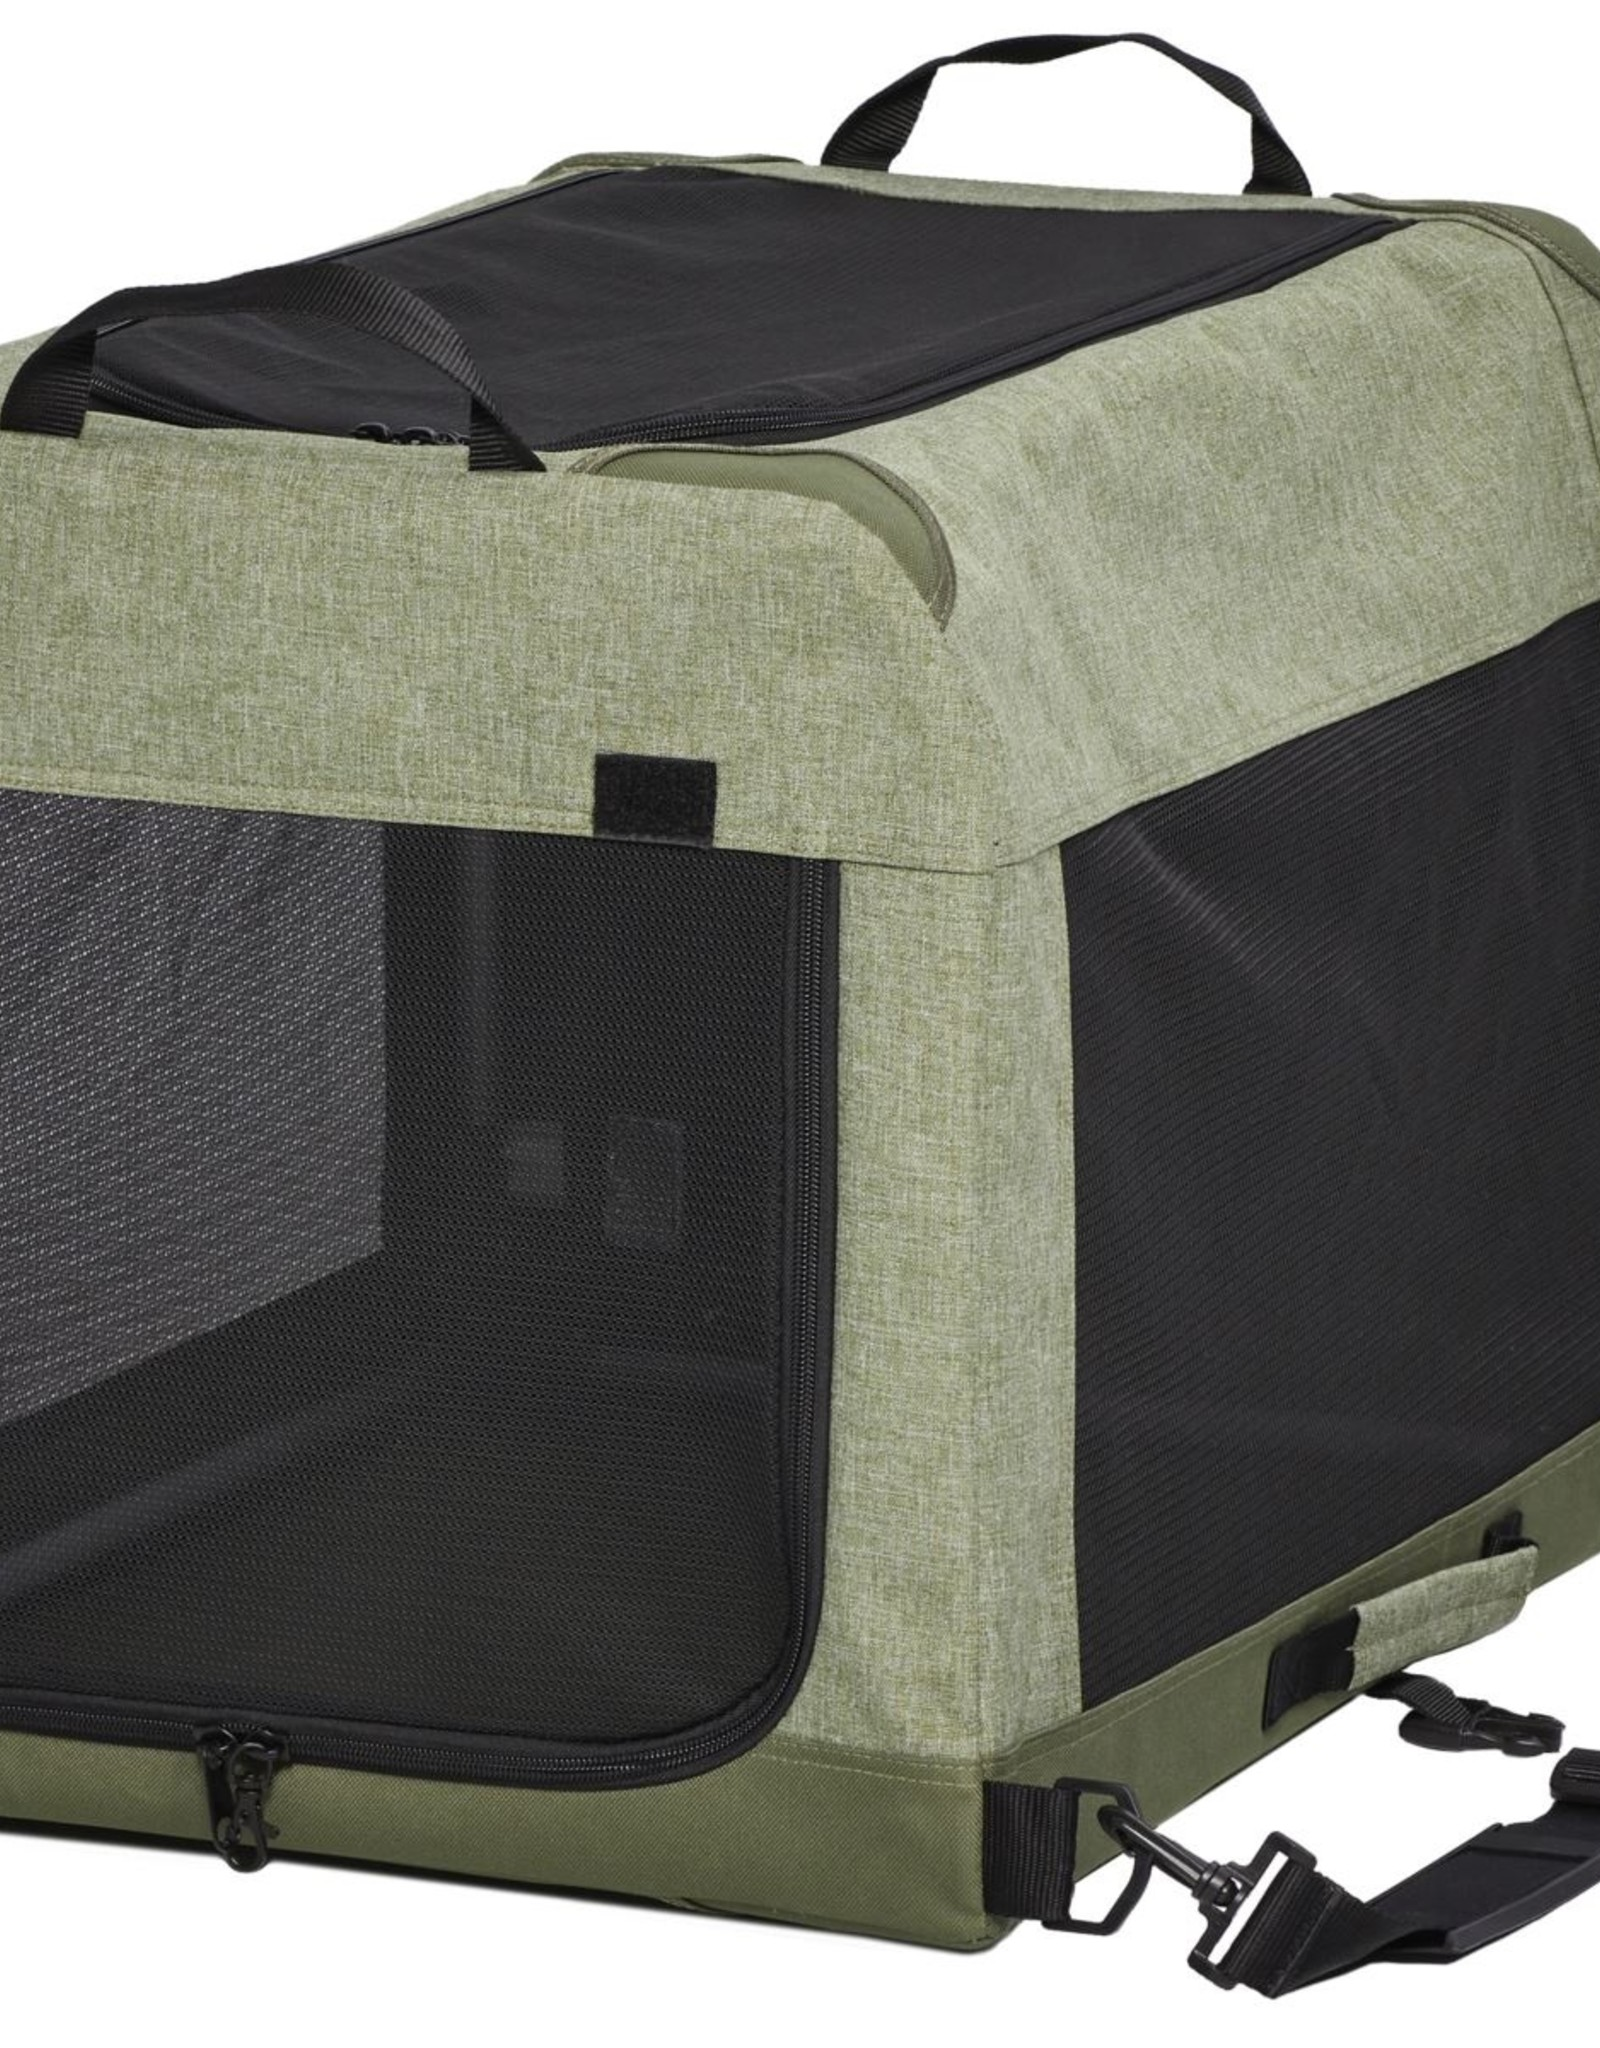 Canine Camper Tent Crates